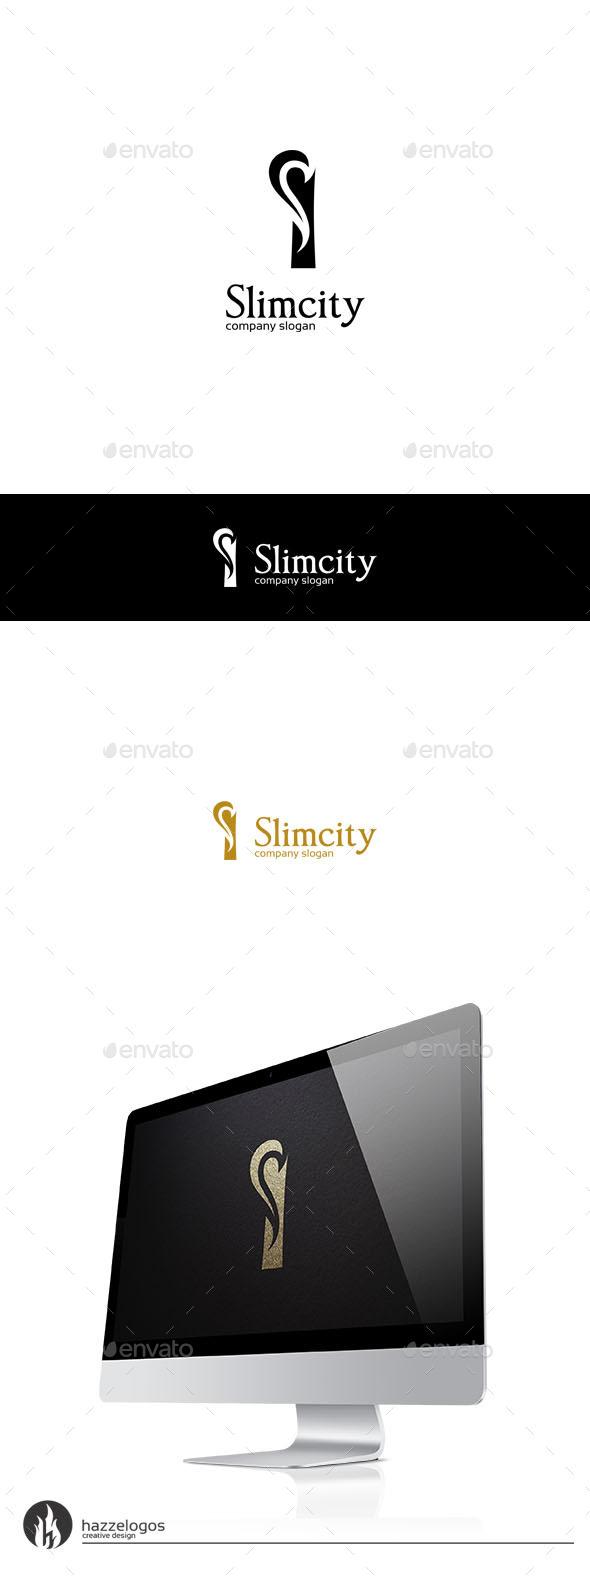 GraphicRiver Slimcity Logo 9940446